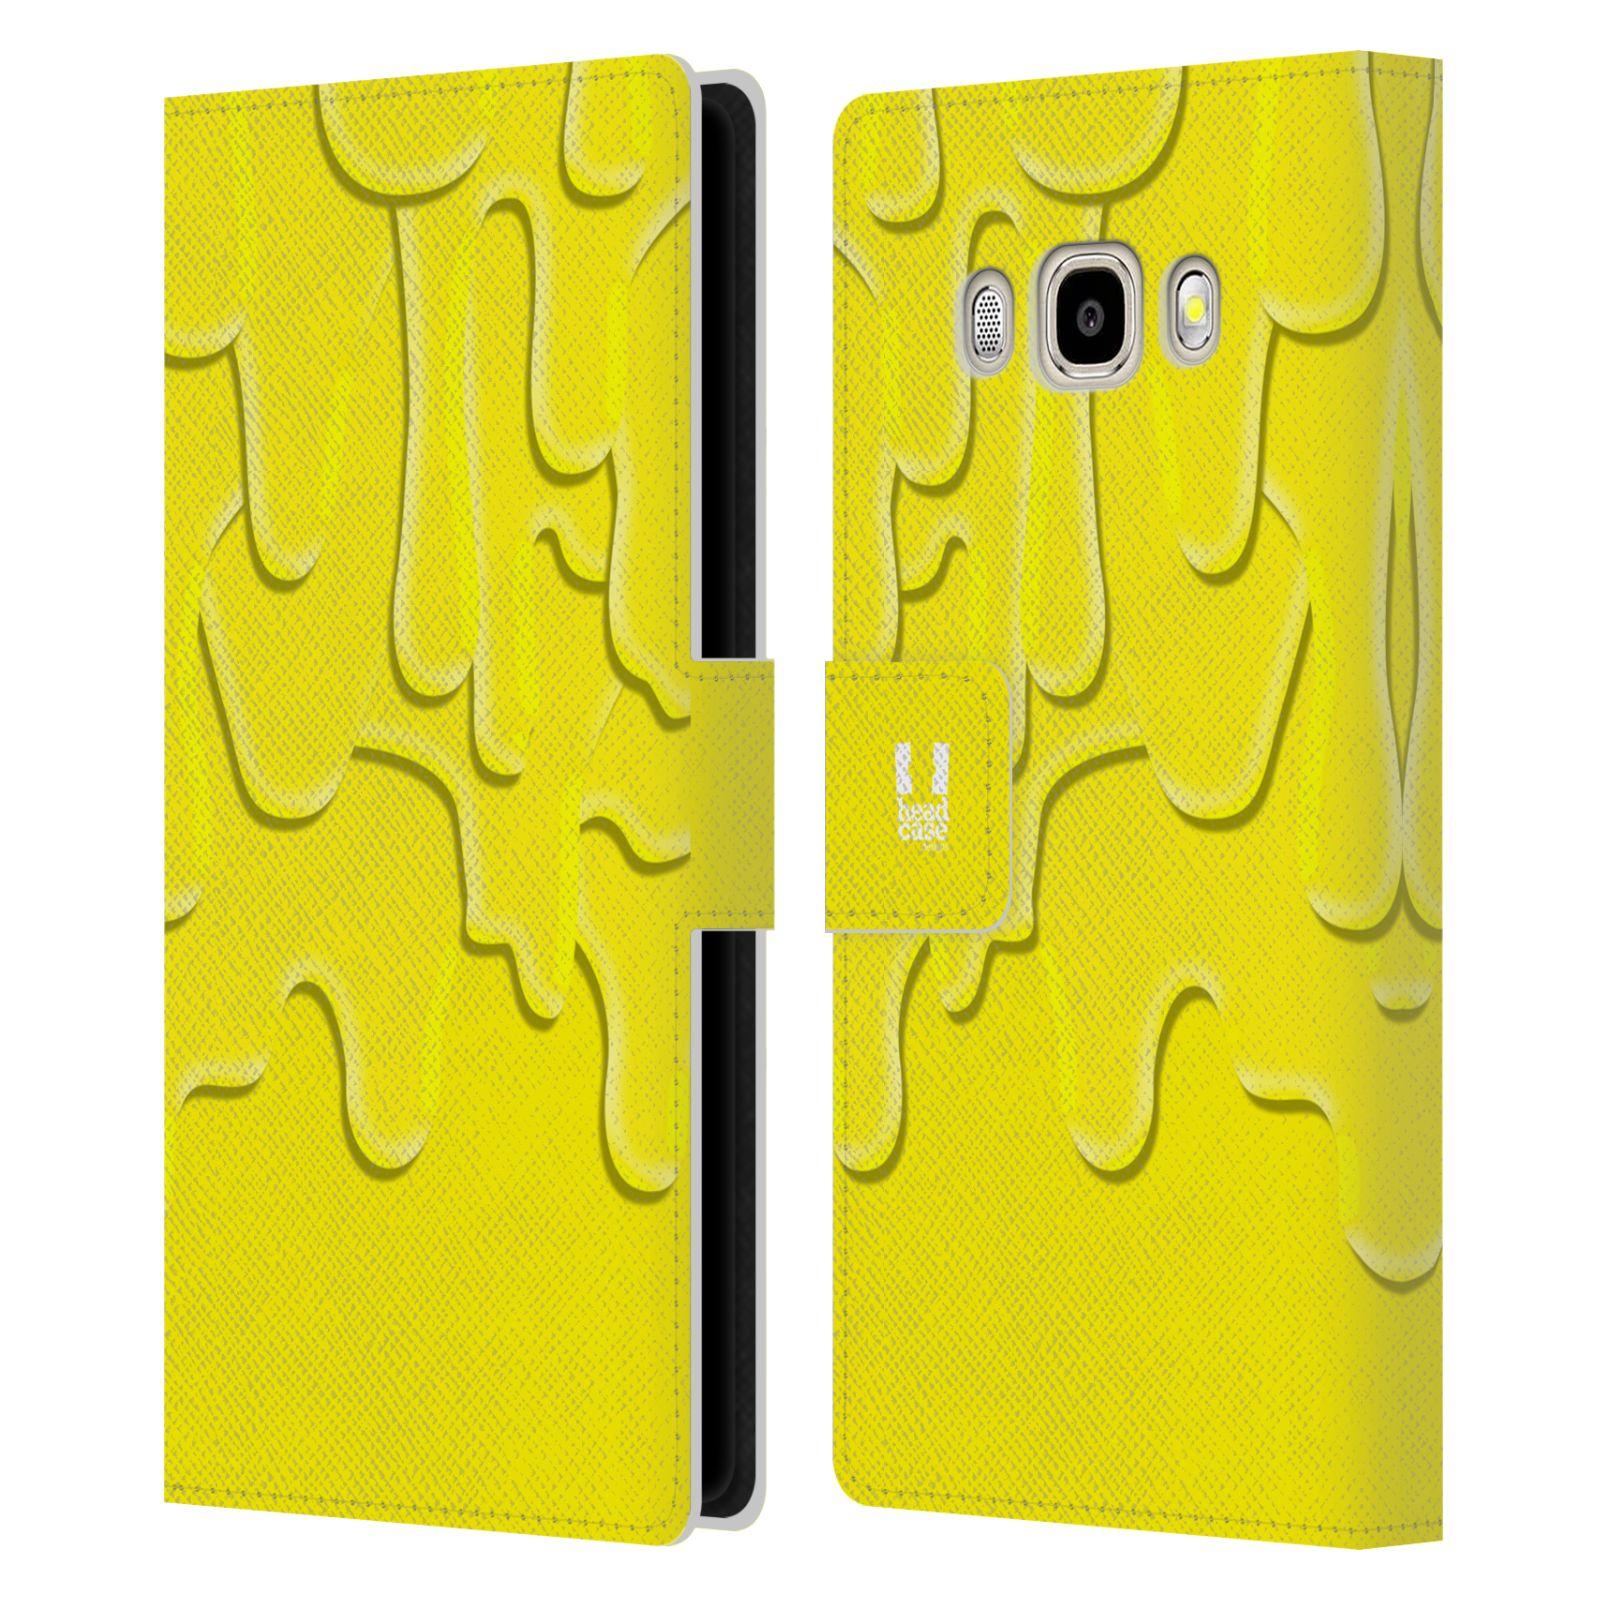 HEAD CASE Flipové pouzdro pro mobil Samsung Galaxy J5 2016 ZÁPLAVA BARVA žlutá